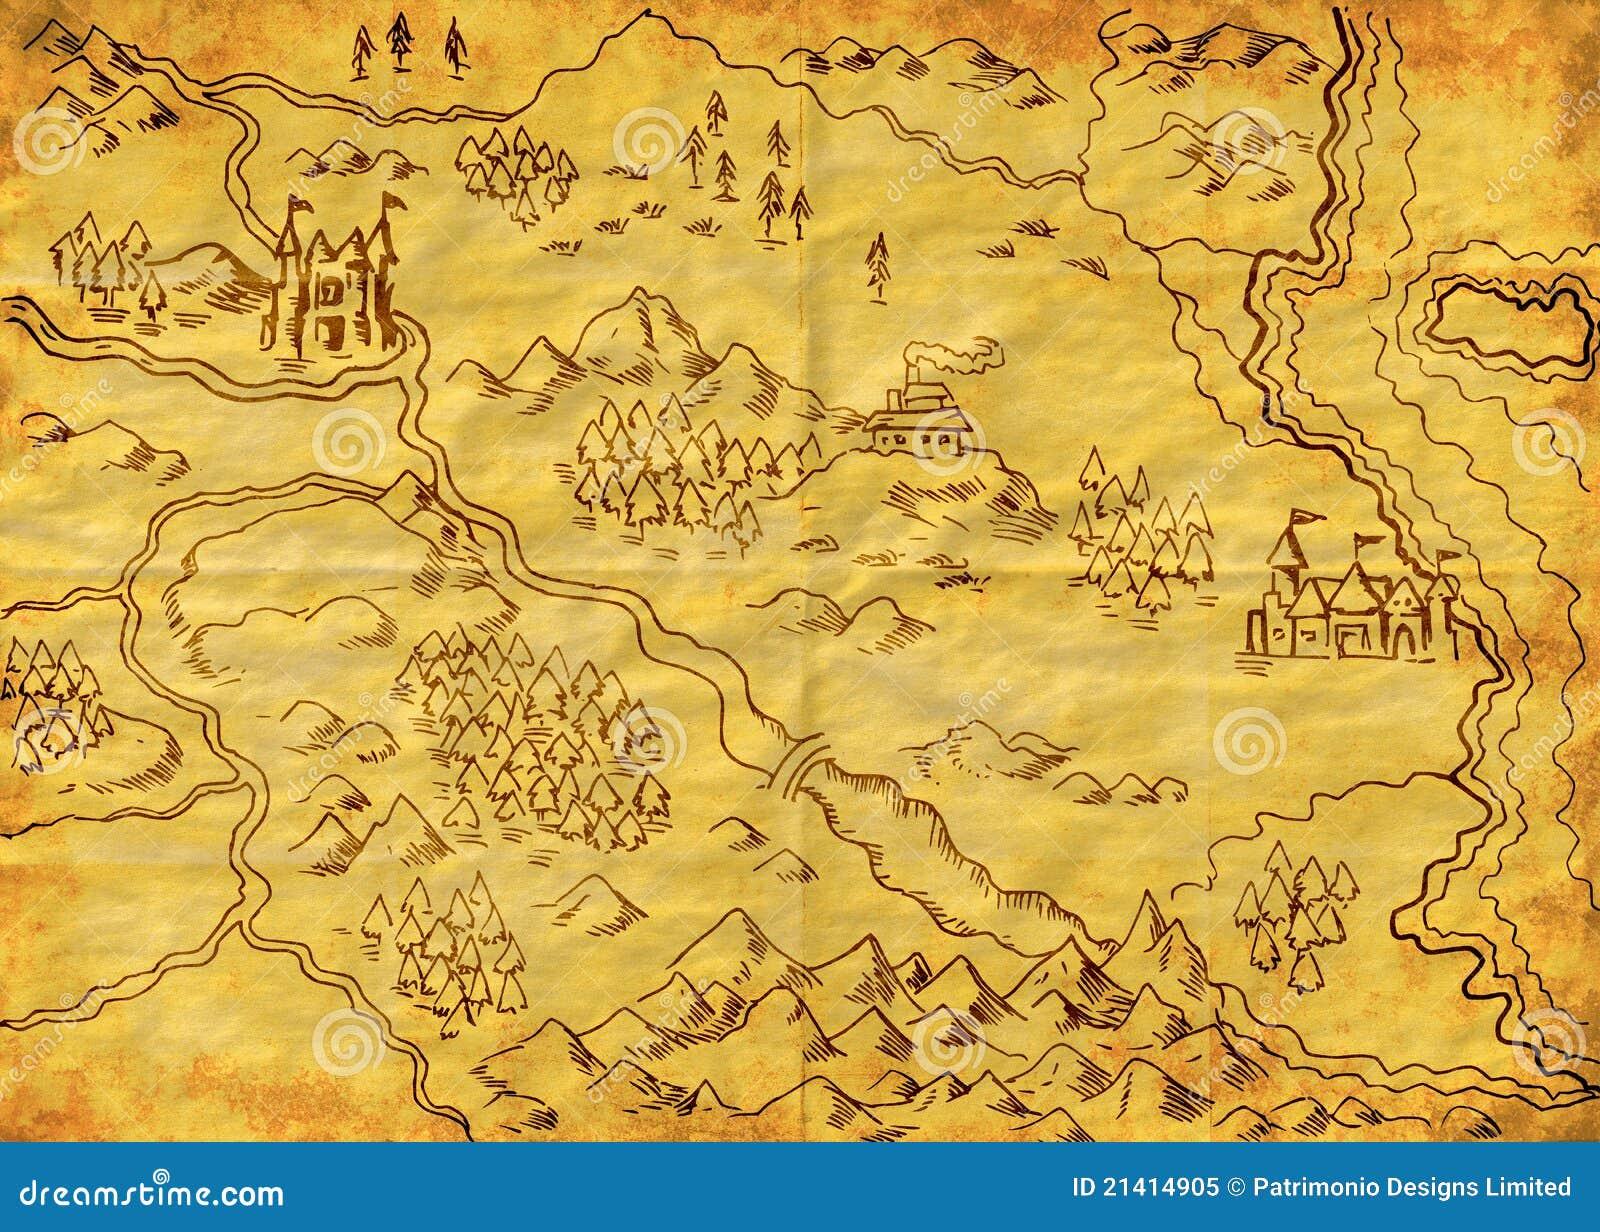 Map Of The World Grunge Royalty Free Stock Photo Image